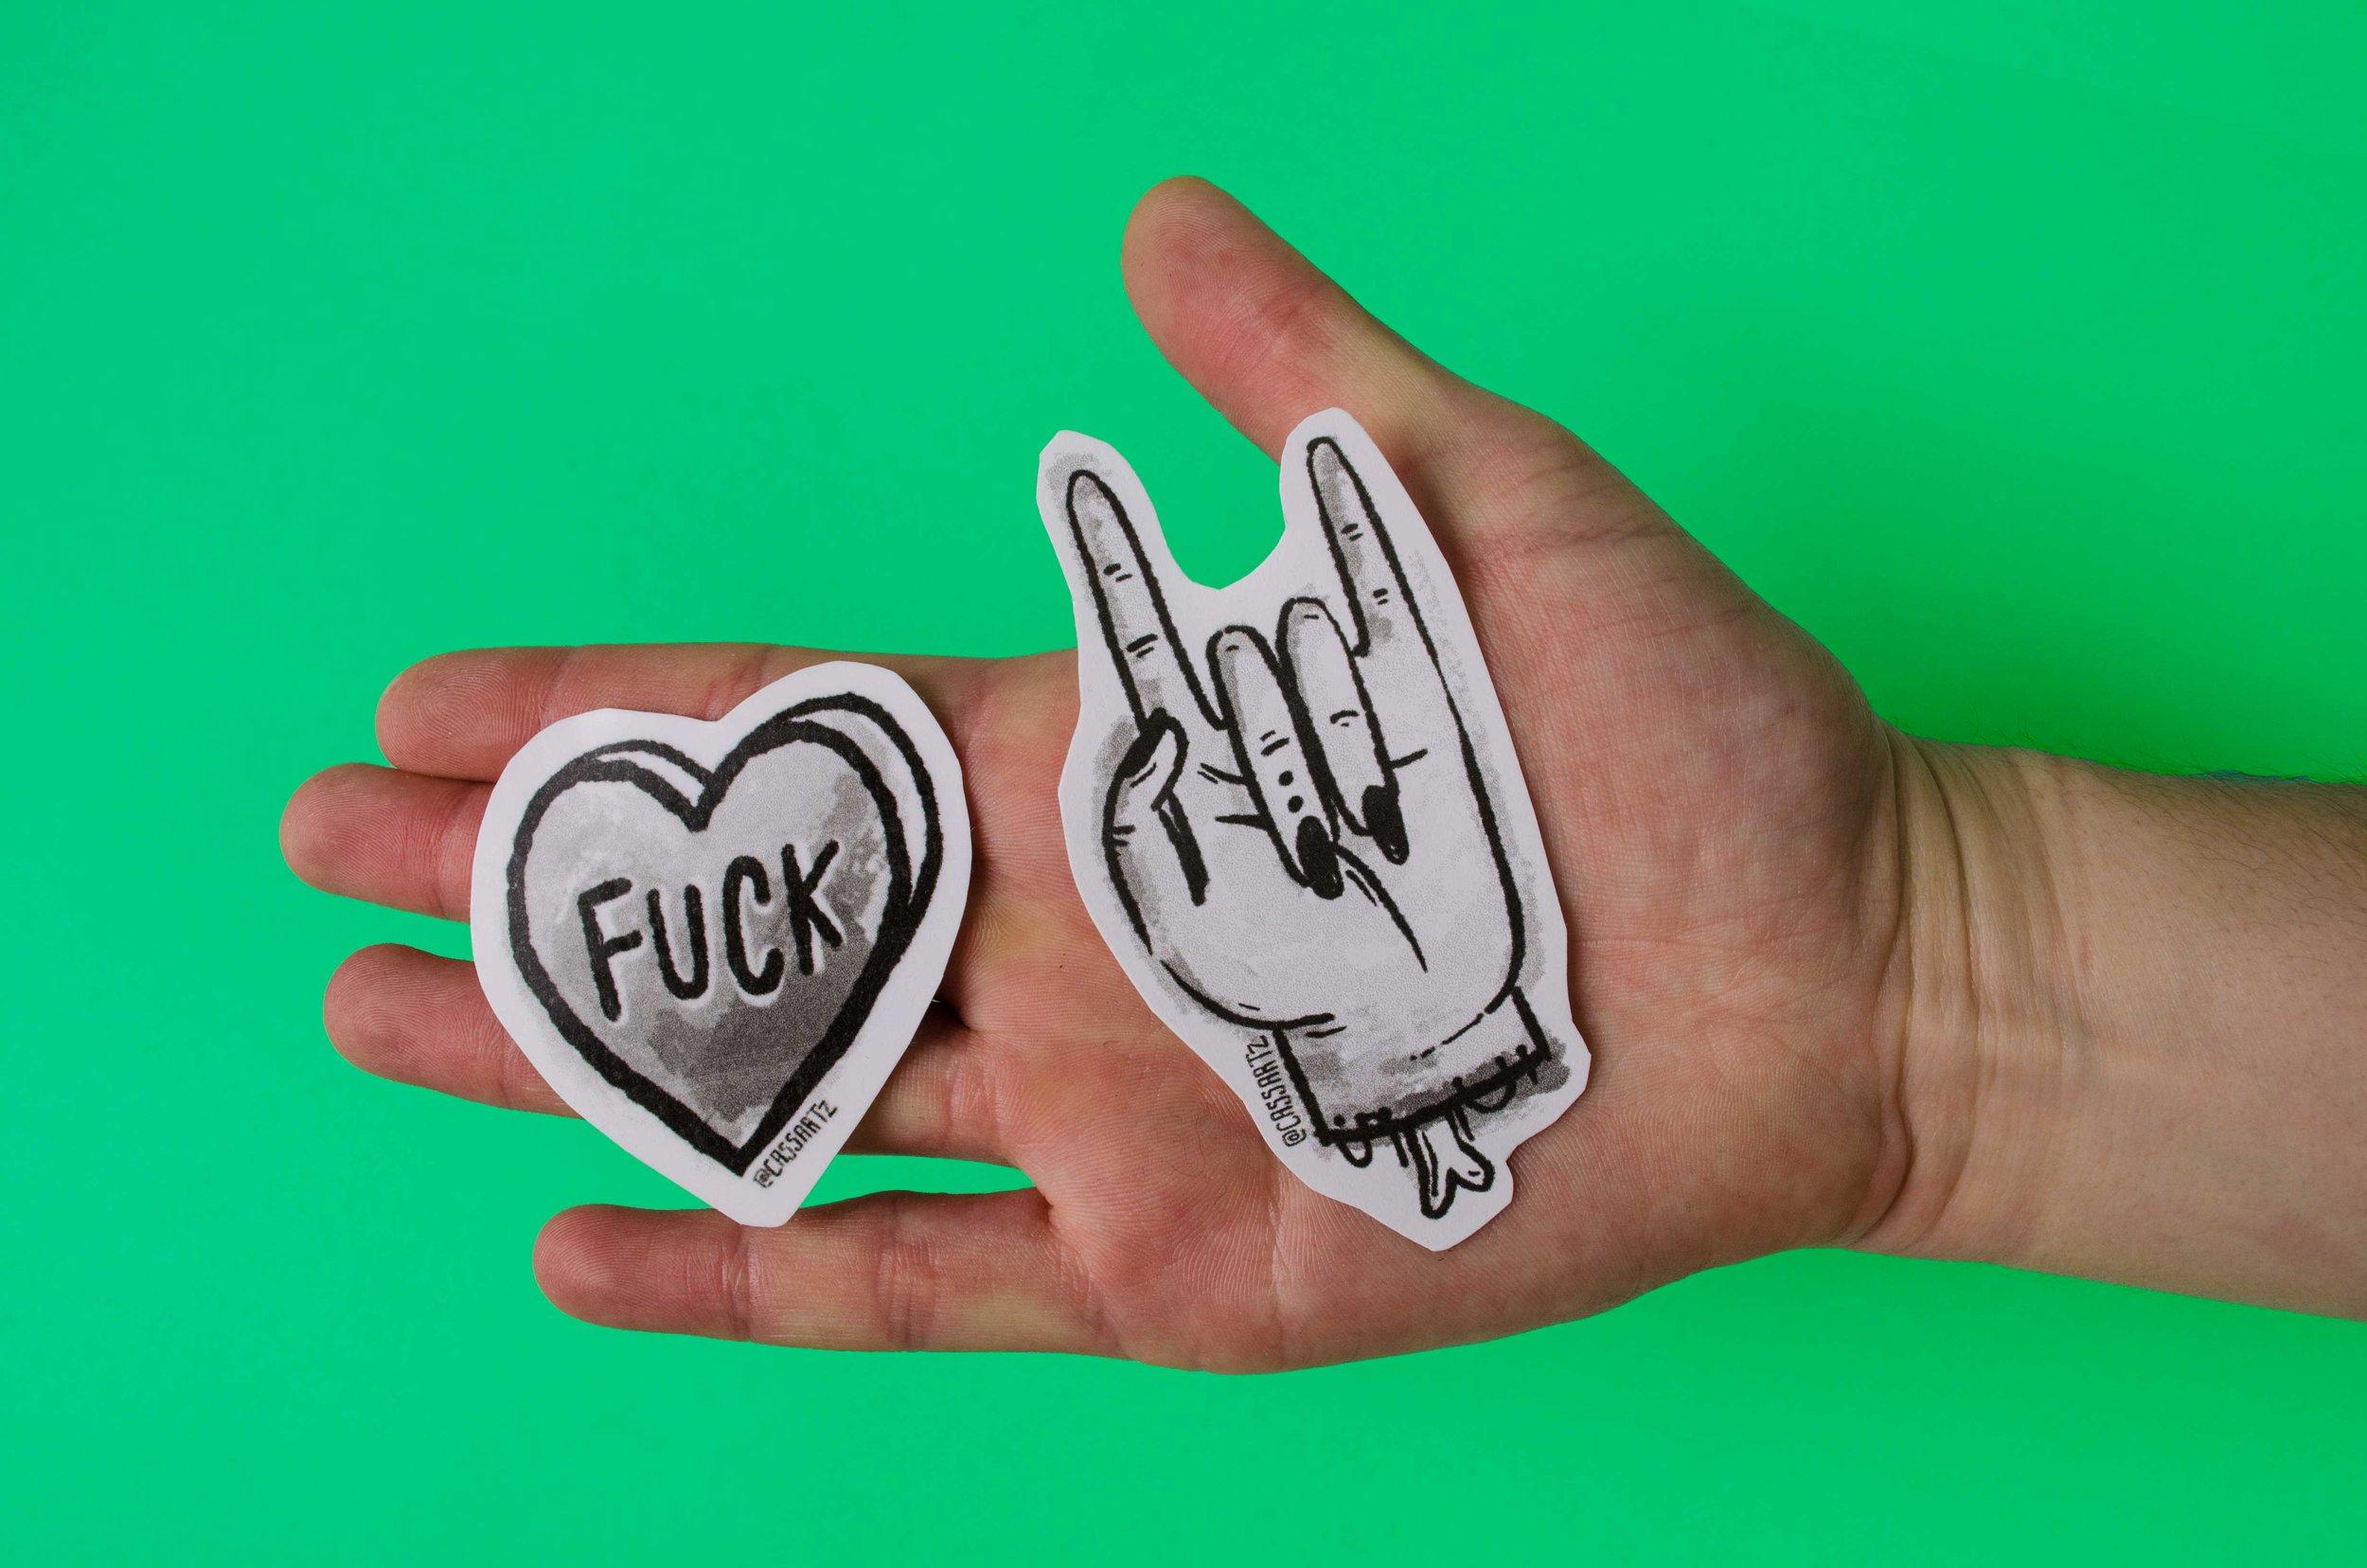 Rock N' Roll & Fuck Stickers by Cassandra Fountaine